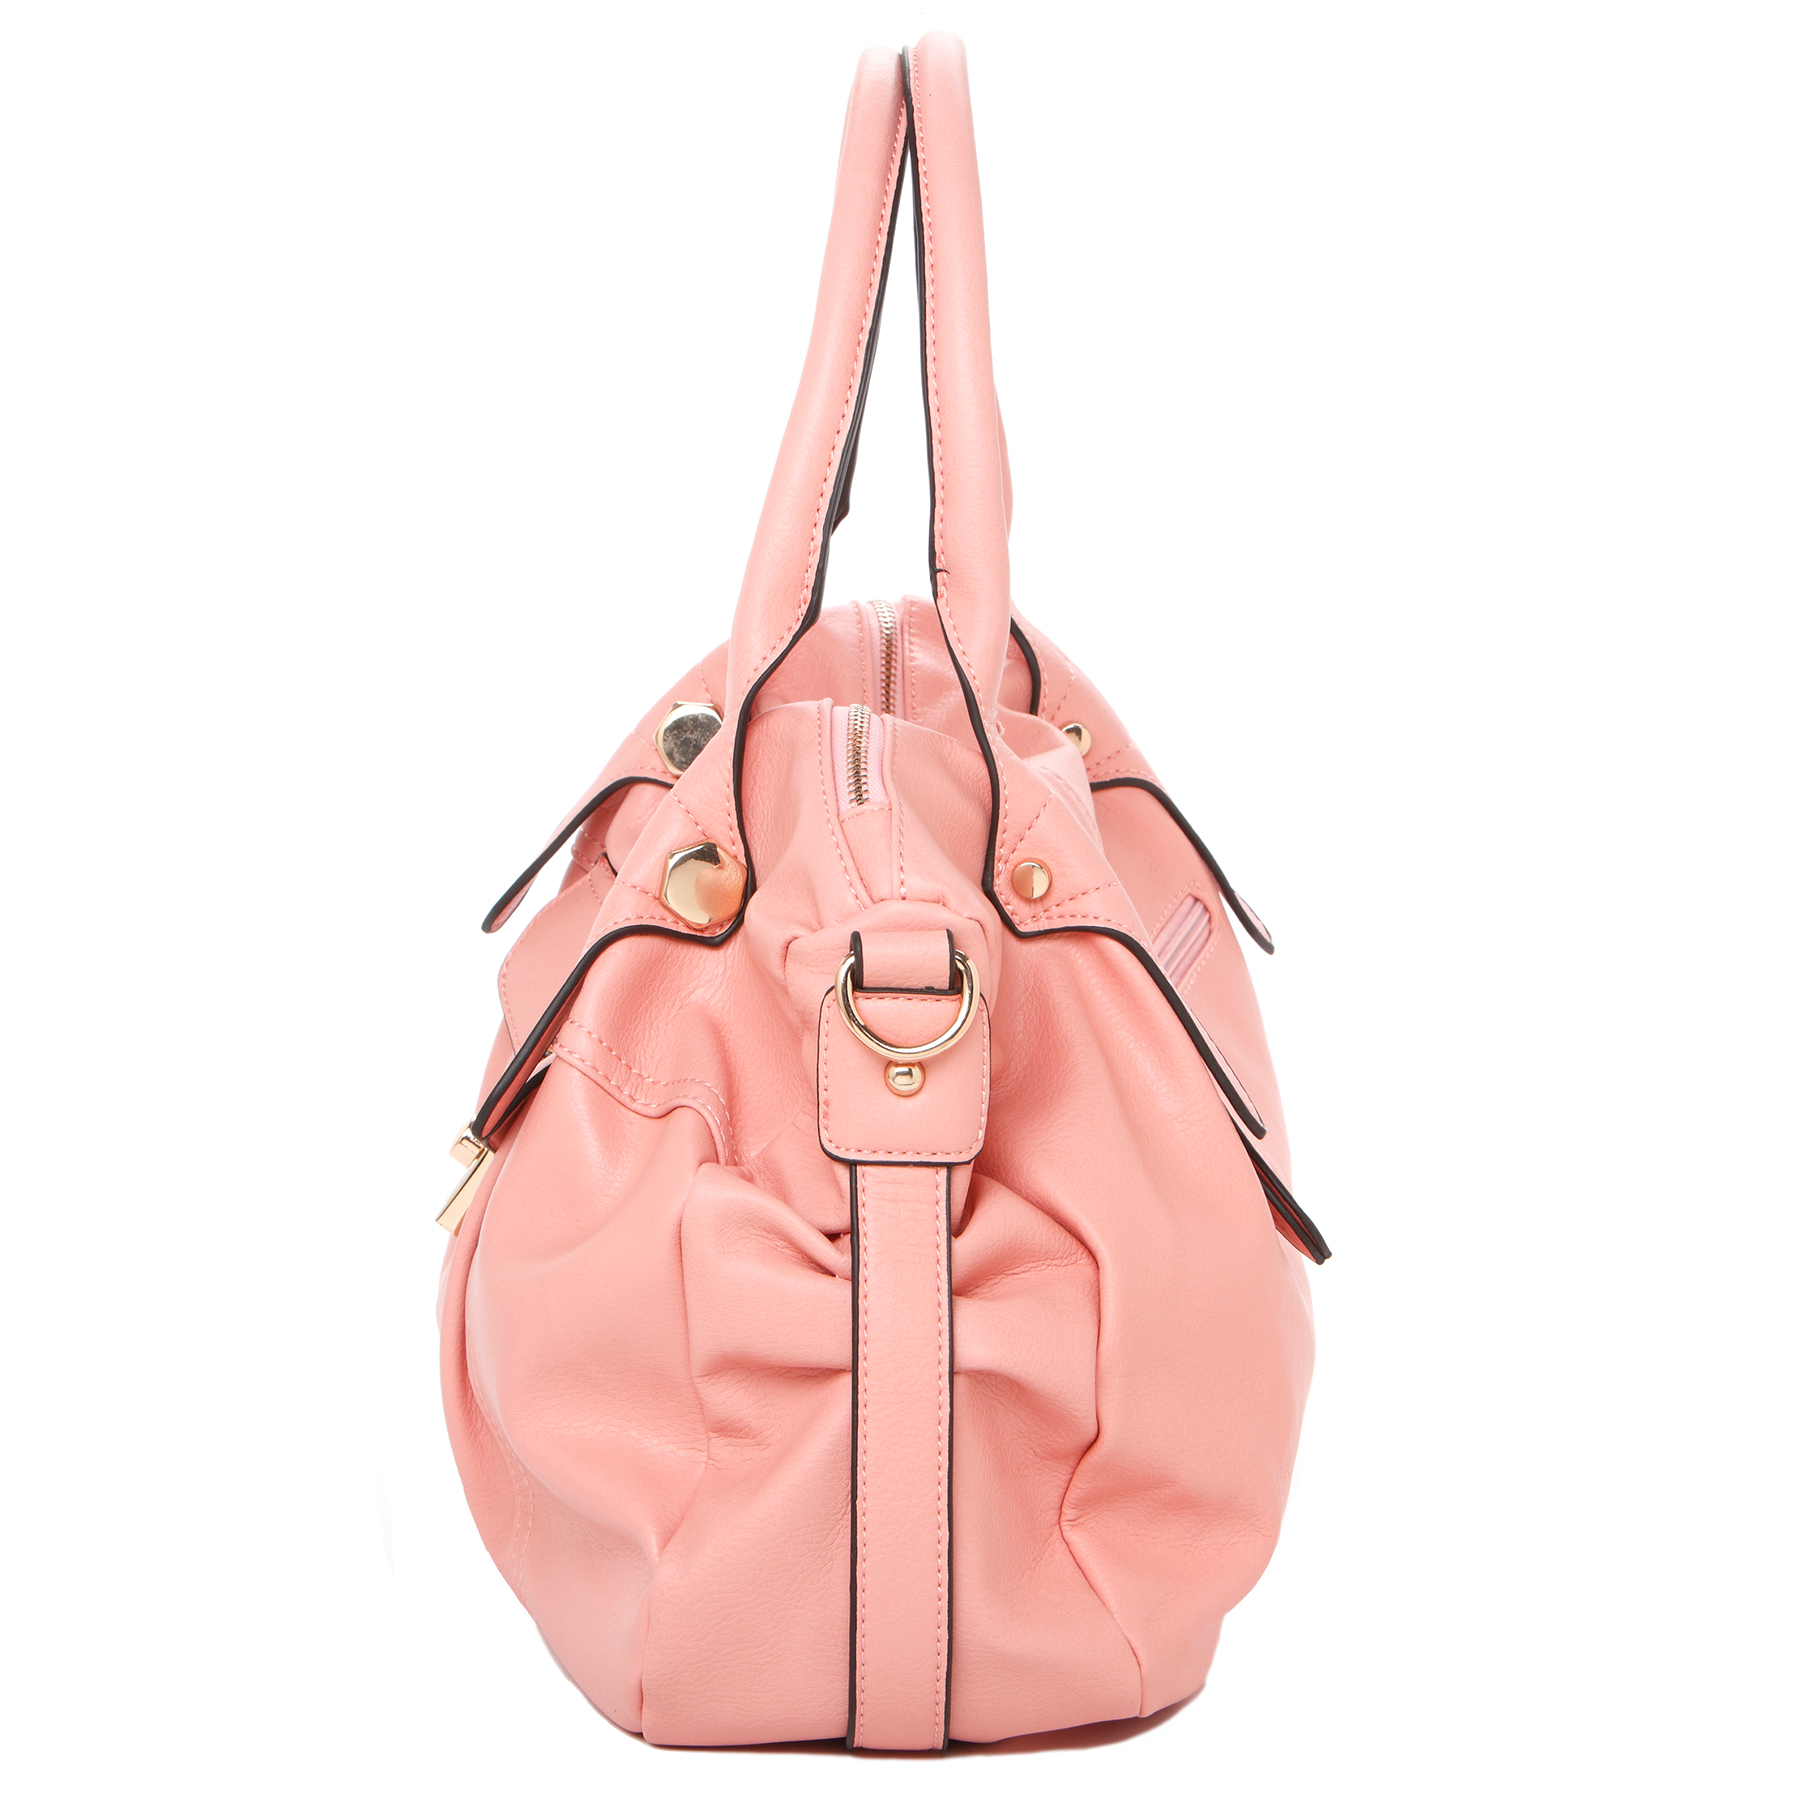 CAME Pink Office Tote Style Satchel Handbag Side